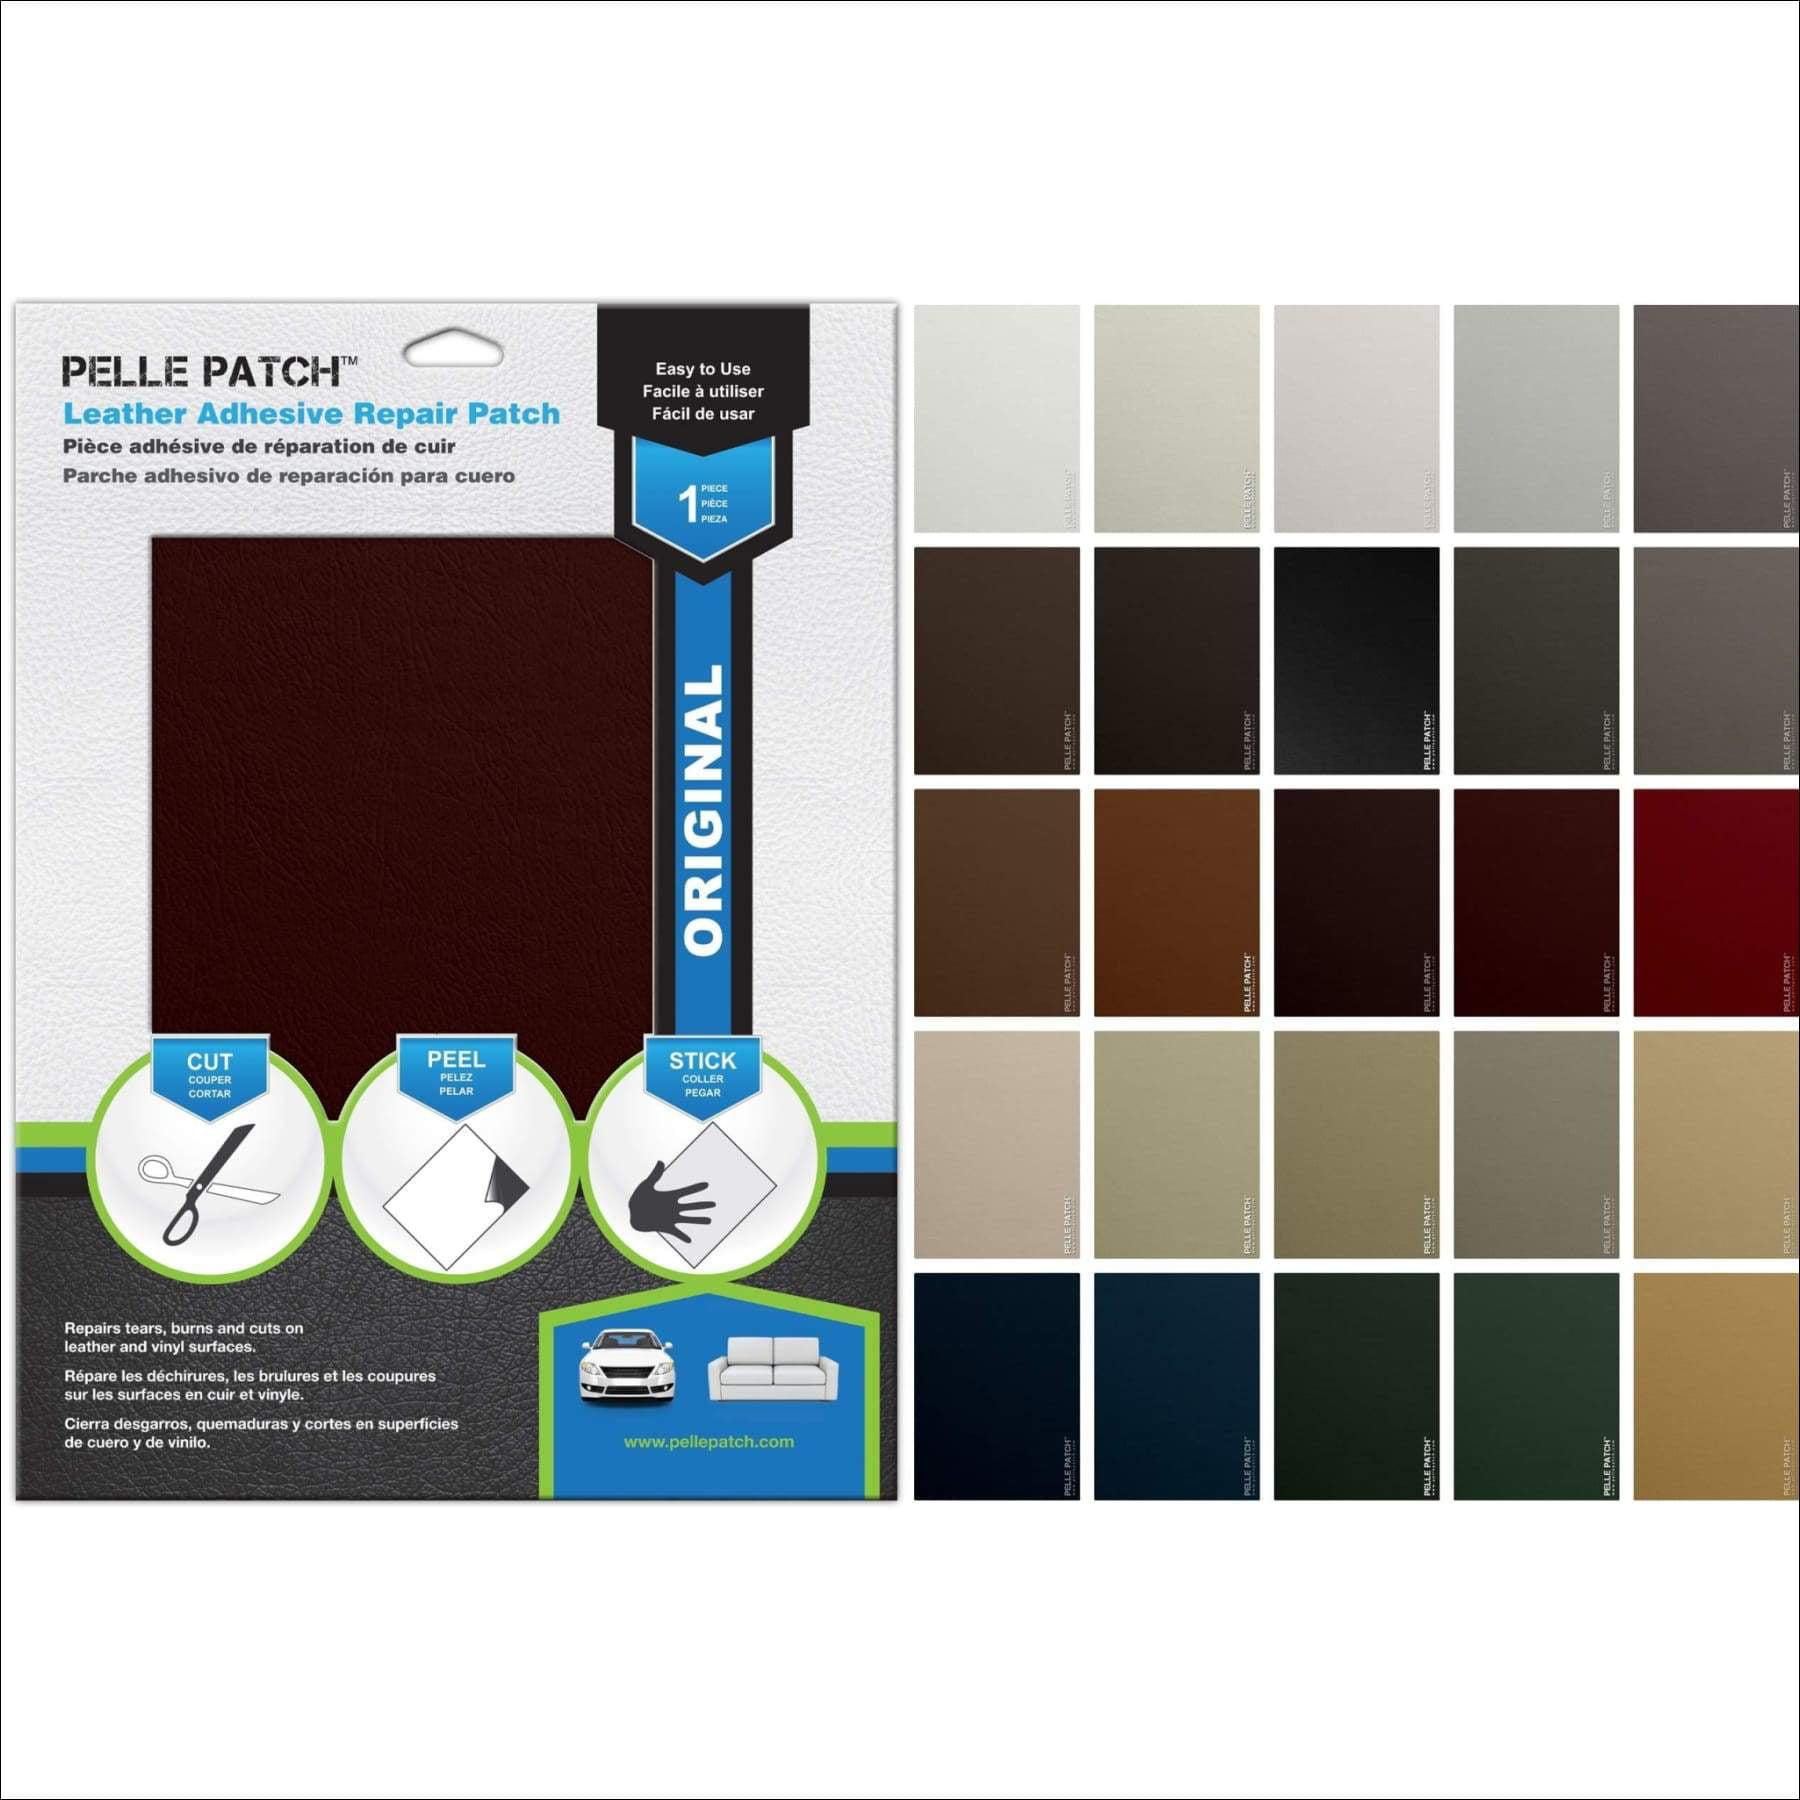 Flex 8x11 Tan 5X Leather /& Vinyl Adhesive Repair Patch Pelle Patch 25 Colors Available